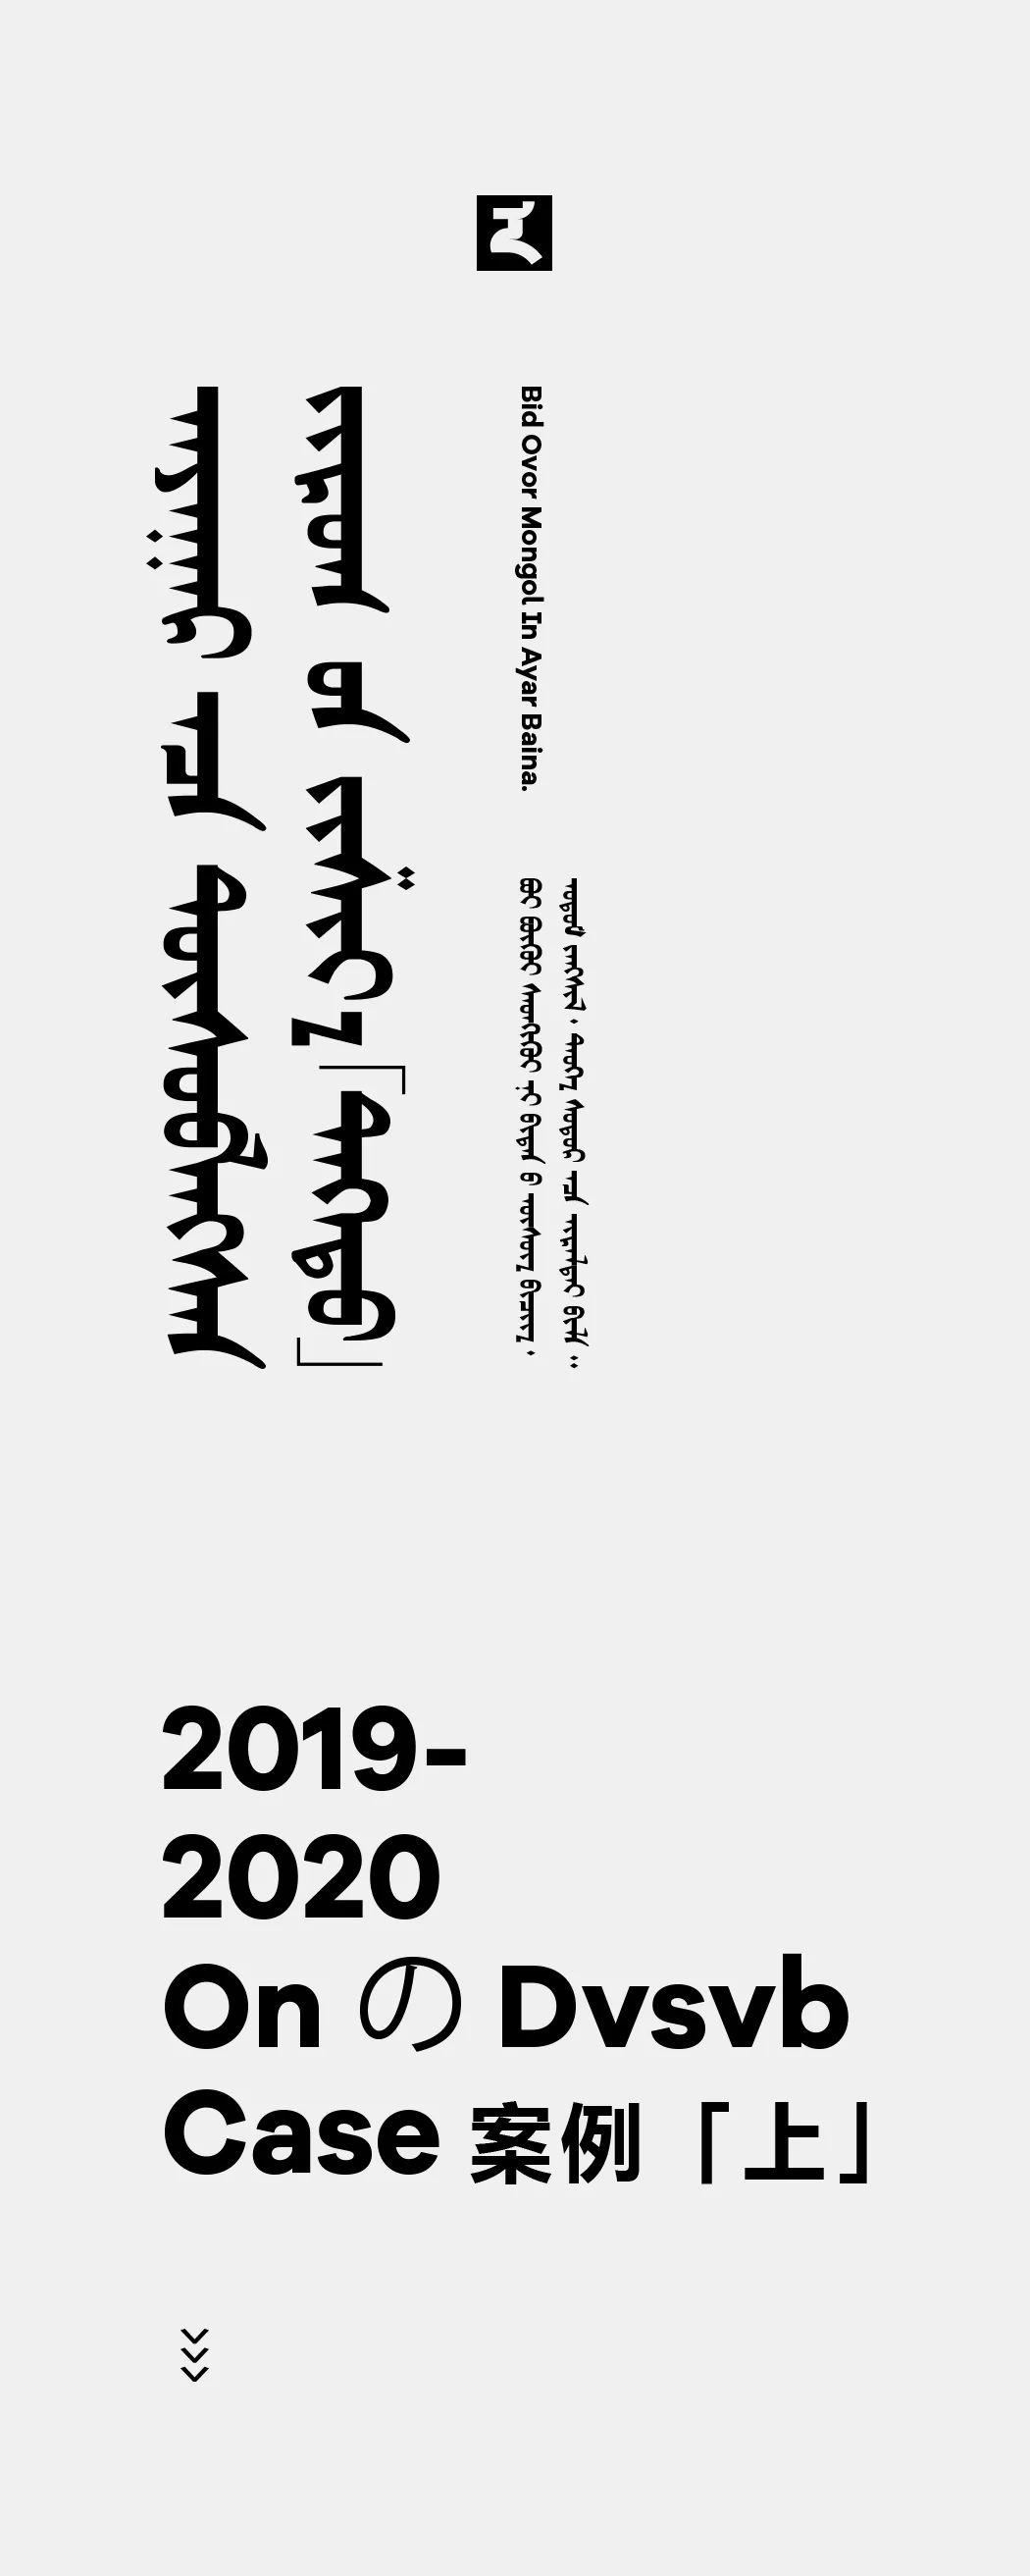 Ayar In 2019-2020 On の Dvsvb